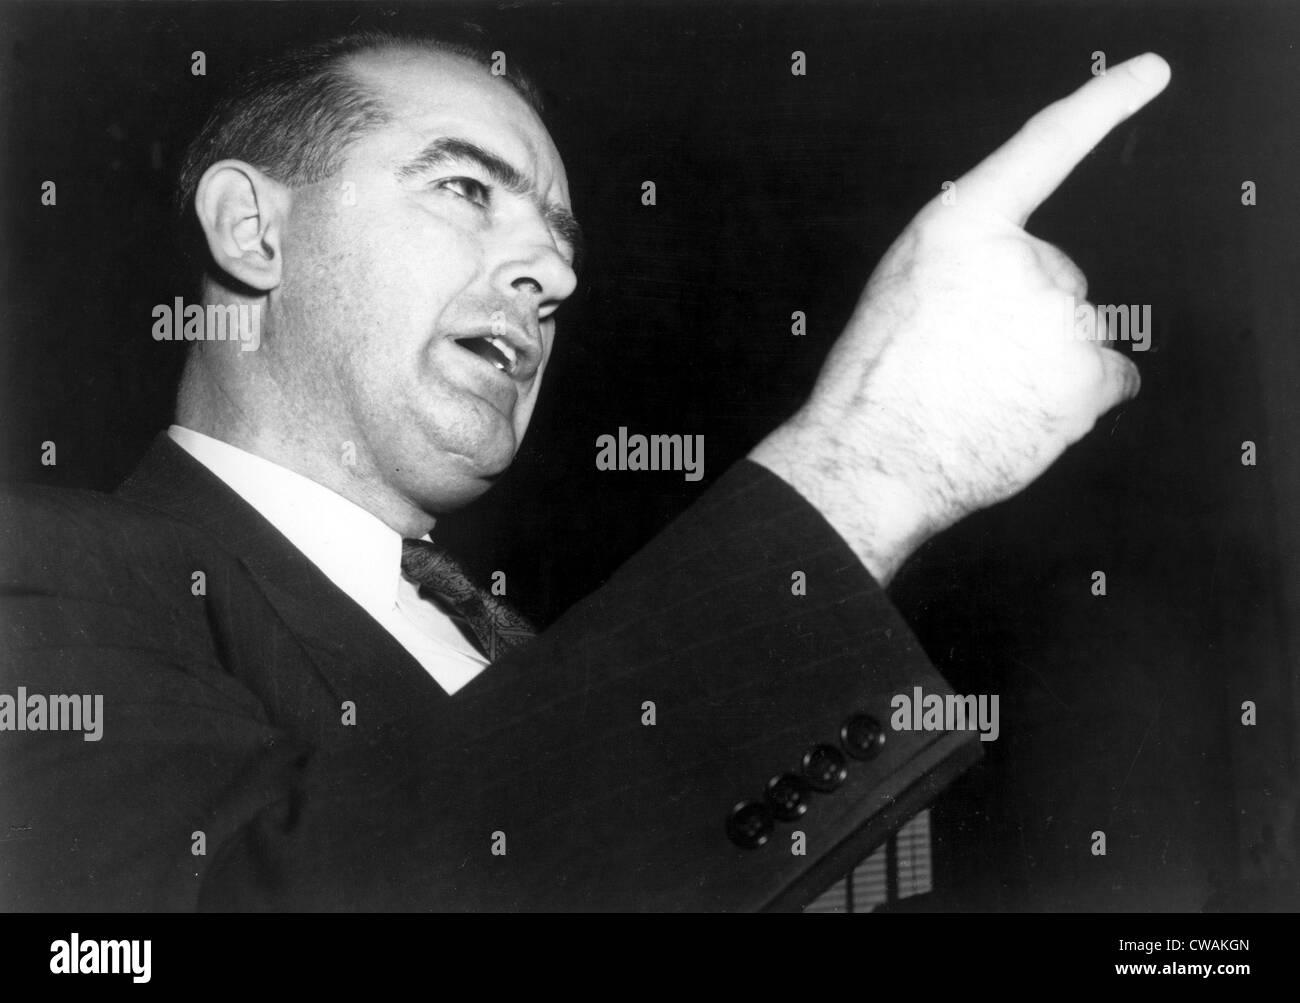 Senator Joseph McCarthy, speaking, 1950s, CSU Archives - Stock Image